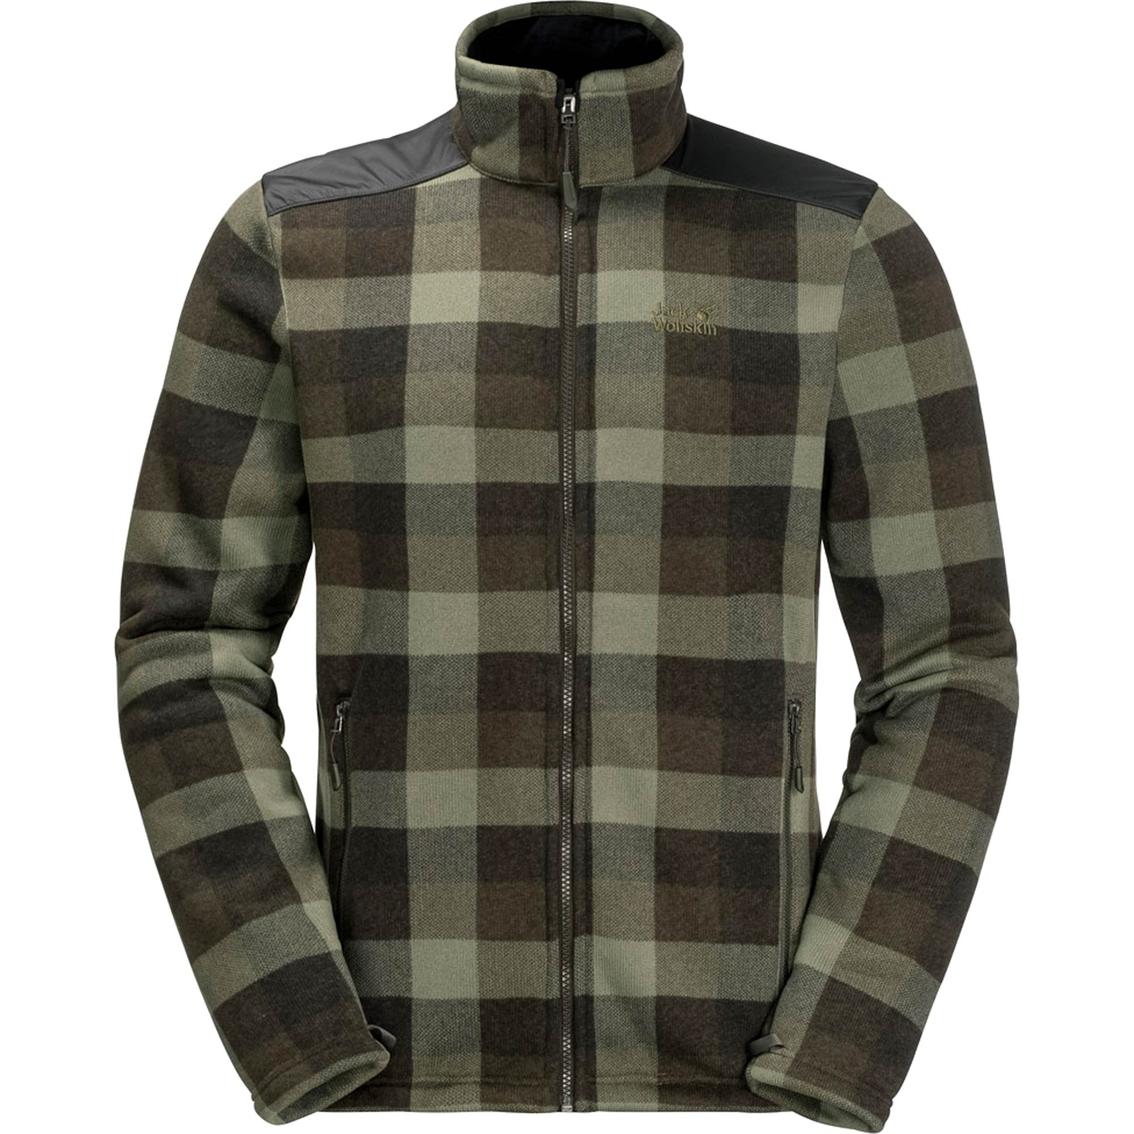 Jack Wolfskin Cabot Check Fleece Jacket | Jackets | Apparel